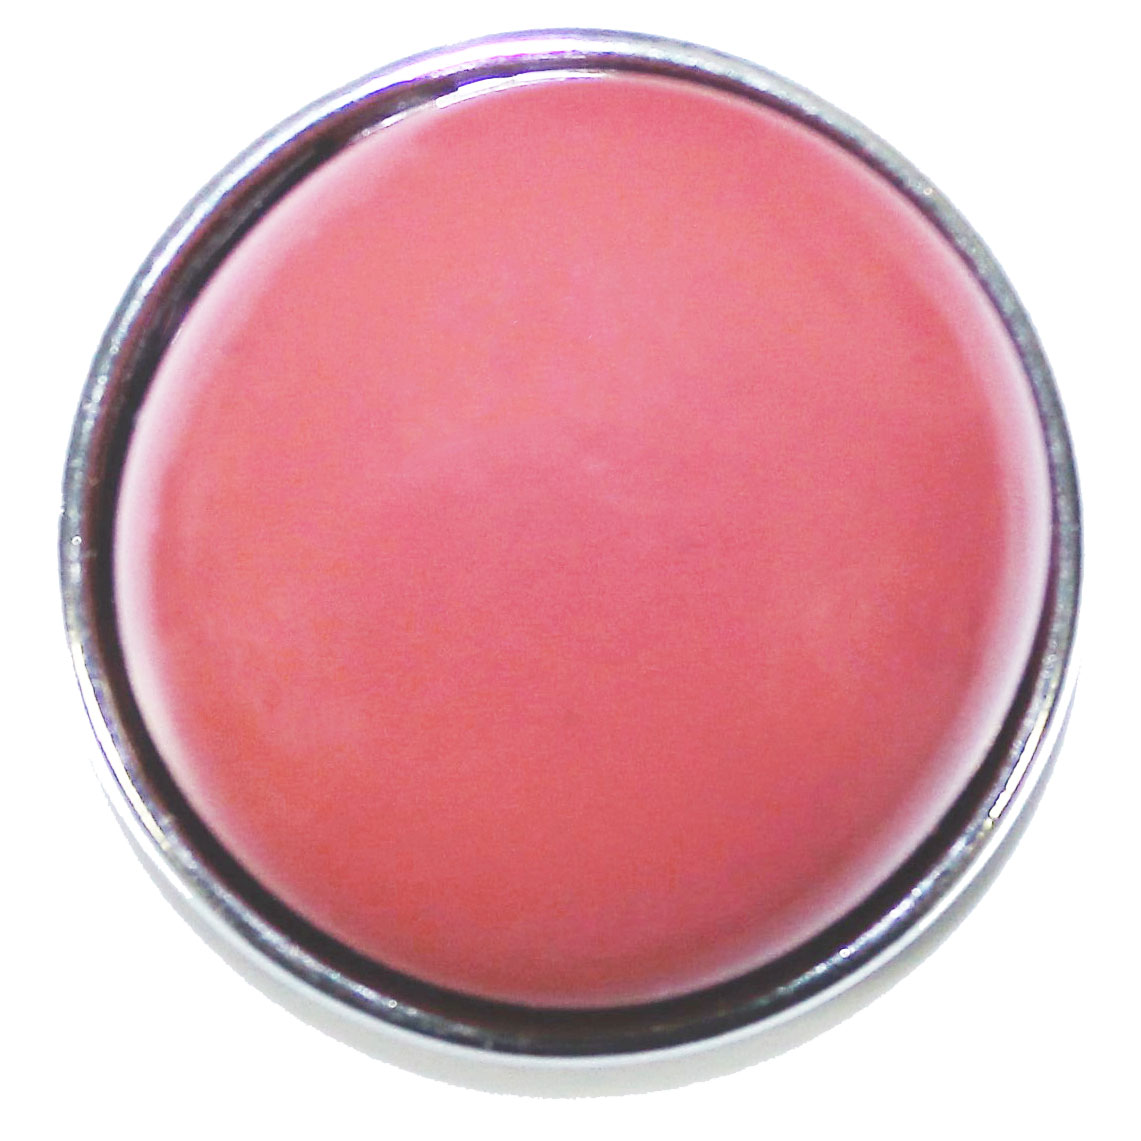 Rosée-199S